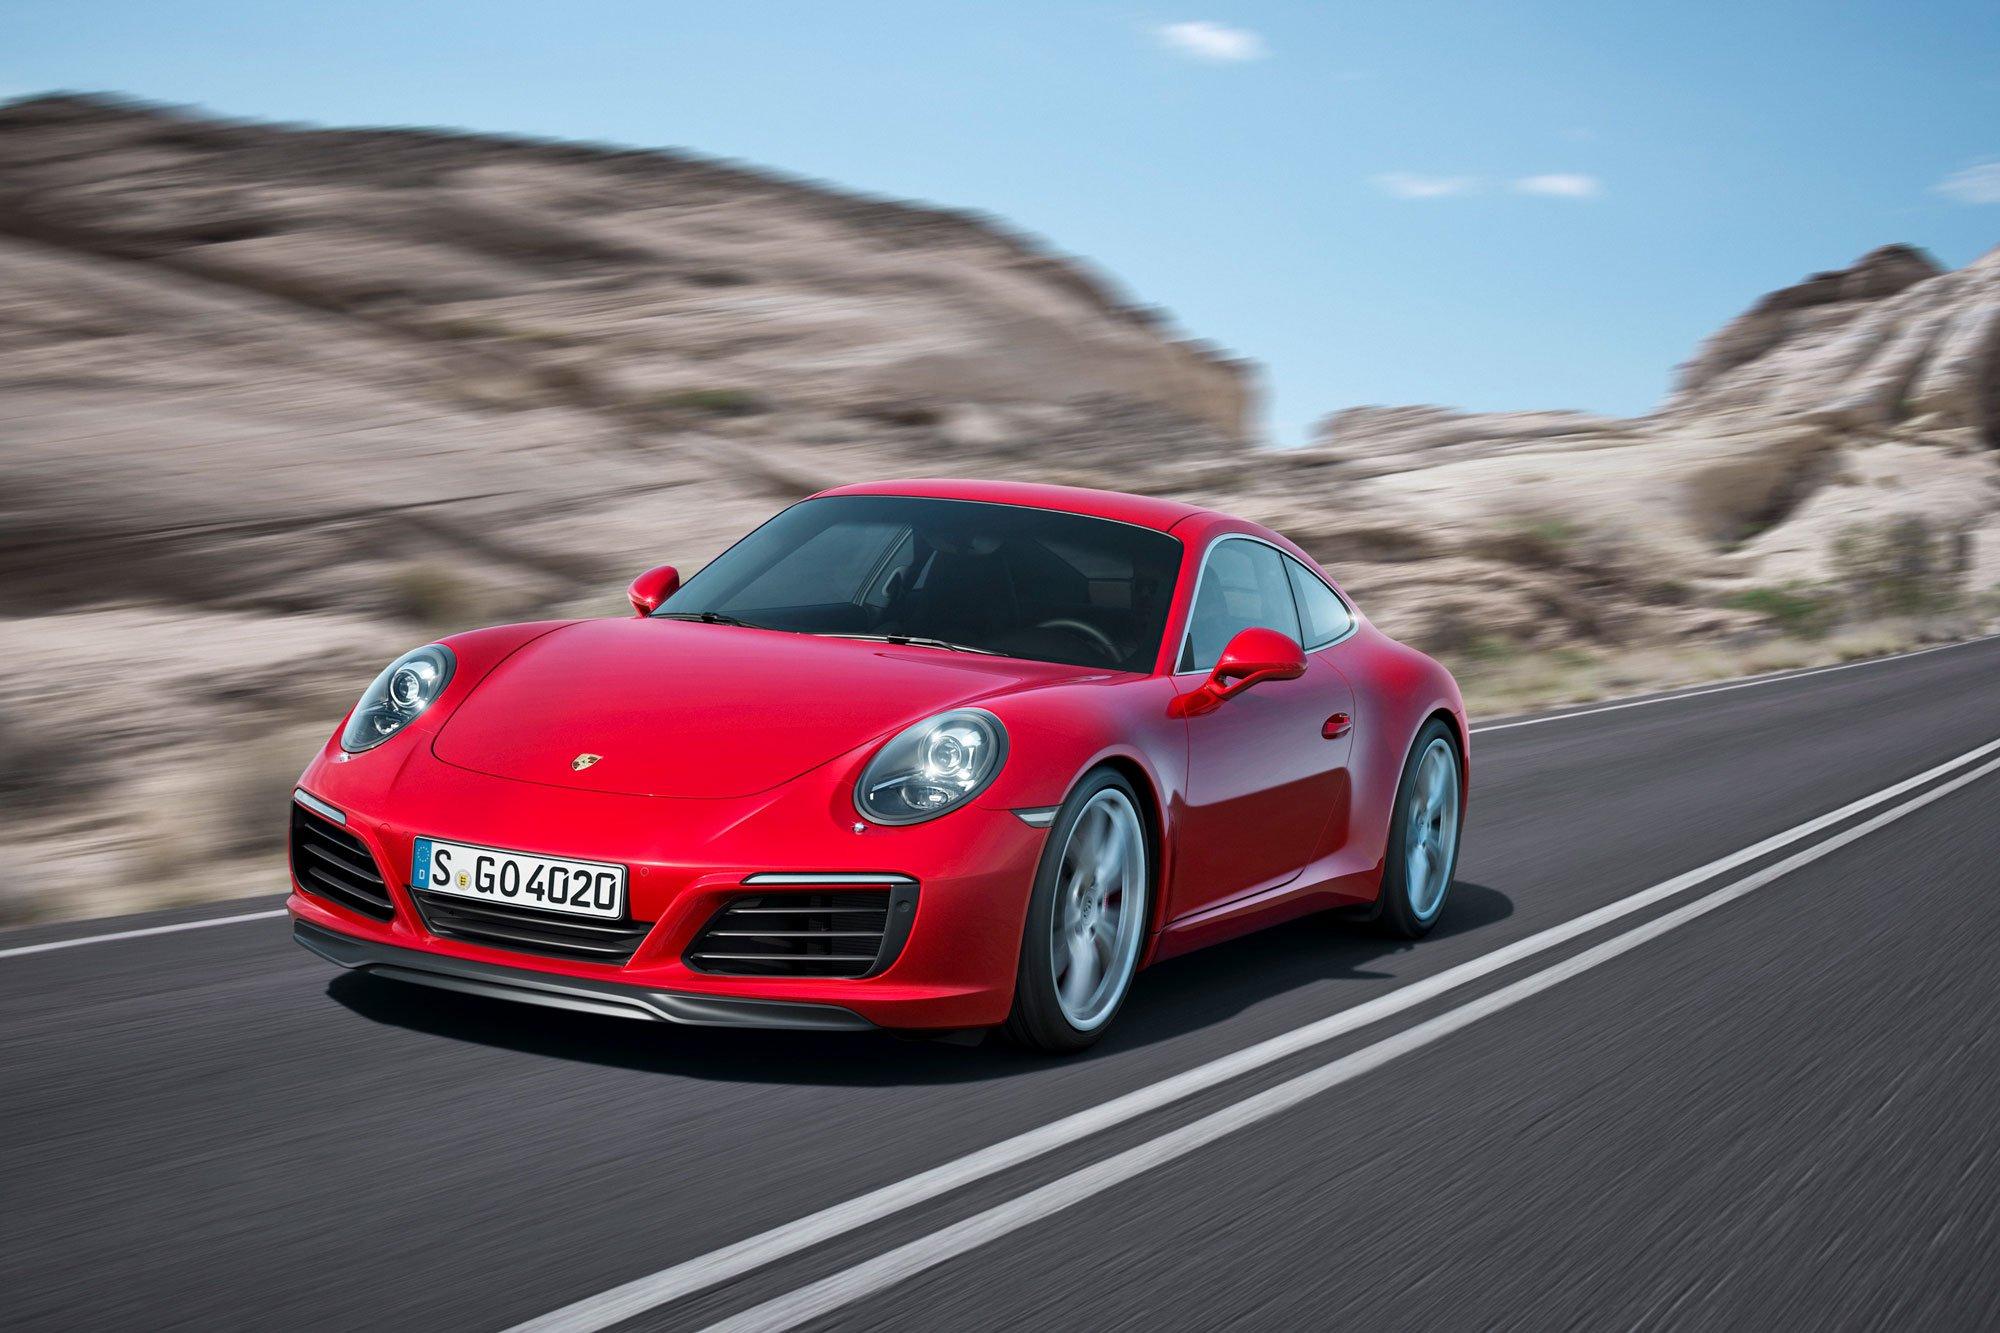 Porsche 911 mit Apple CarPlay statt Android Auto 4